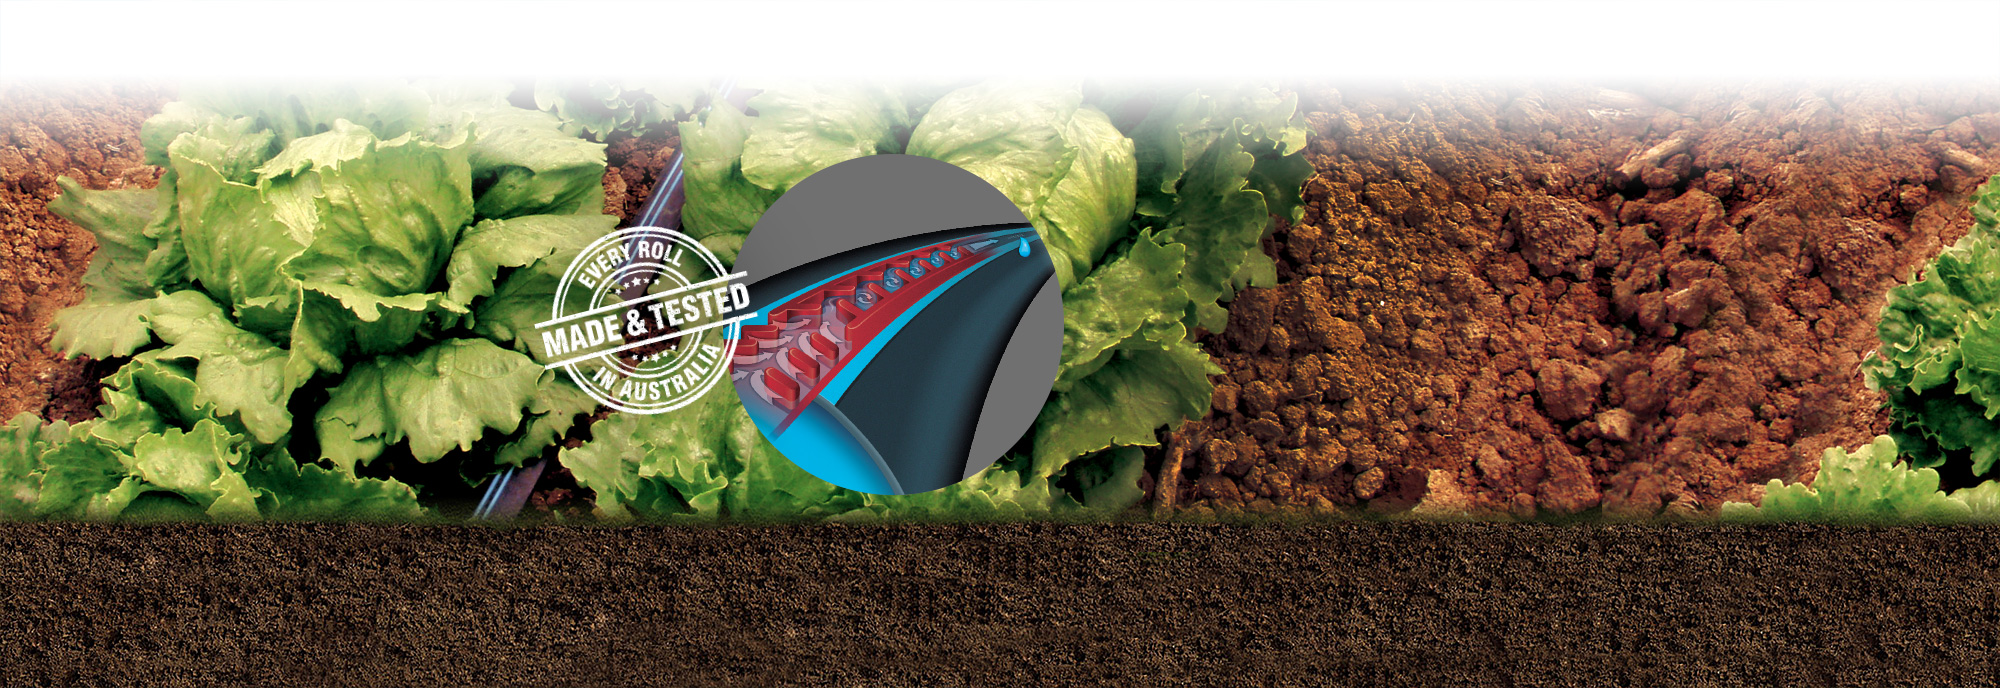 Toro Australia Create A Greater Outdoors Titan 5200 Wiring Diagram Aqua Traxx Pbx